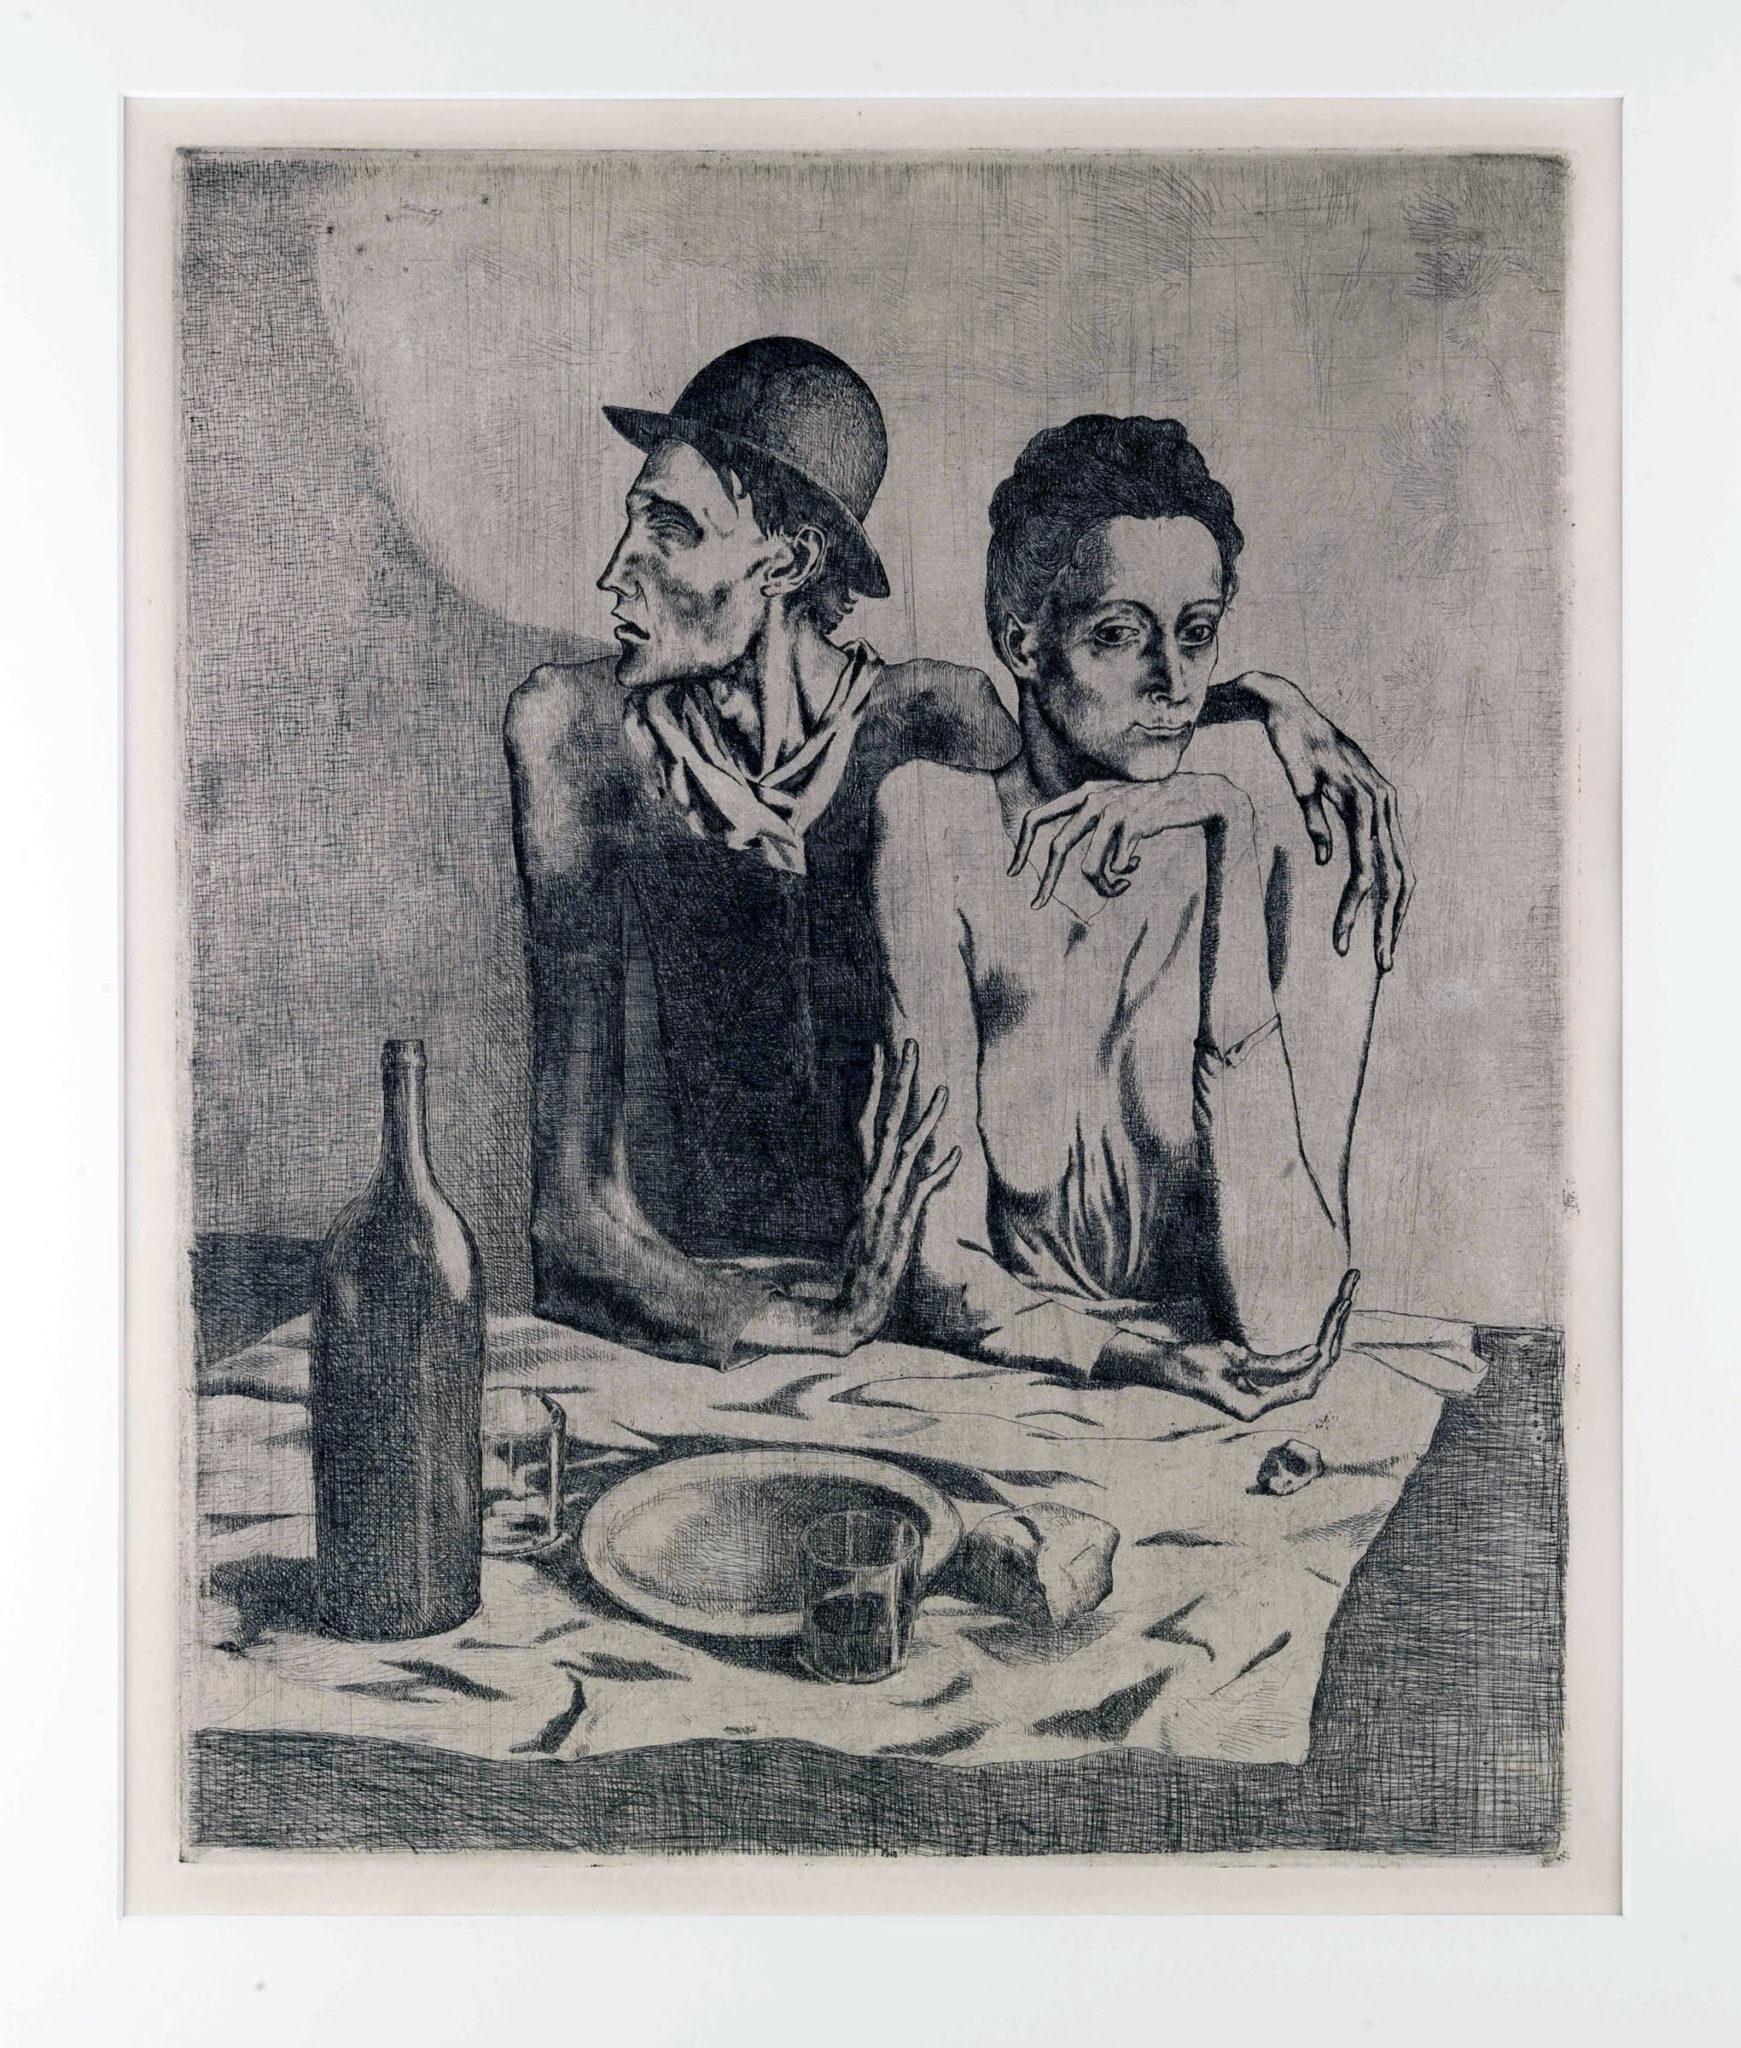 Le repas frugal, 1904, acquaforte, mm 463x377